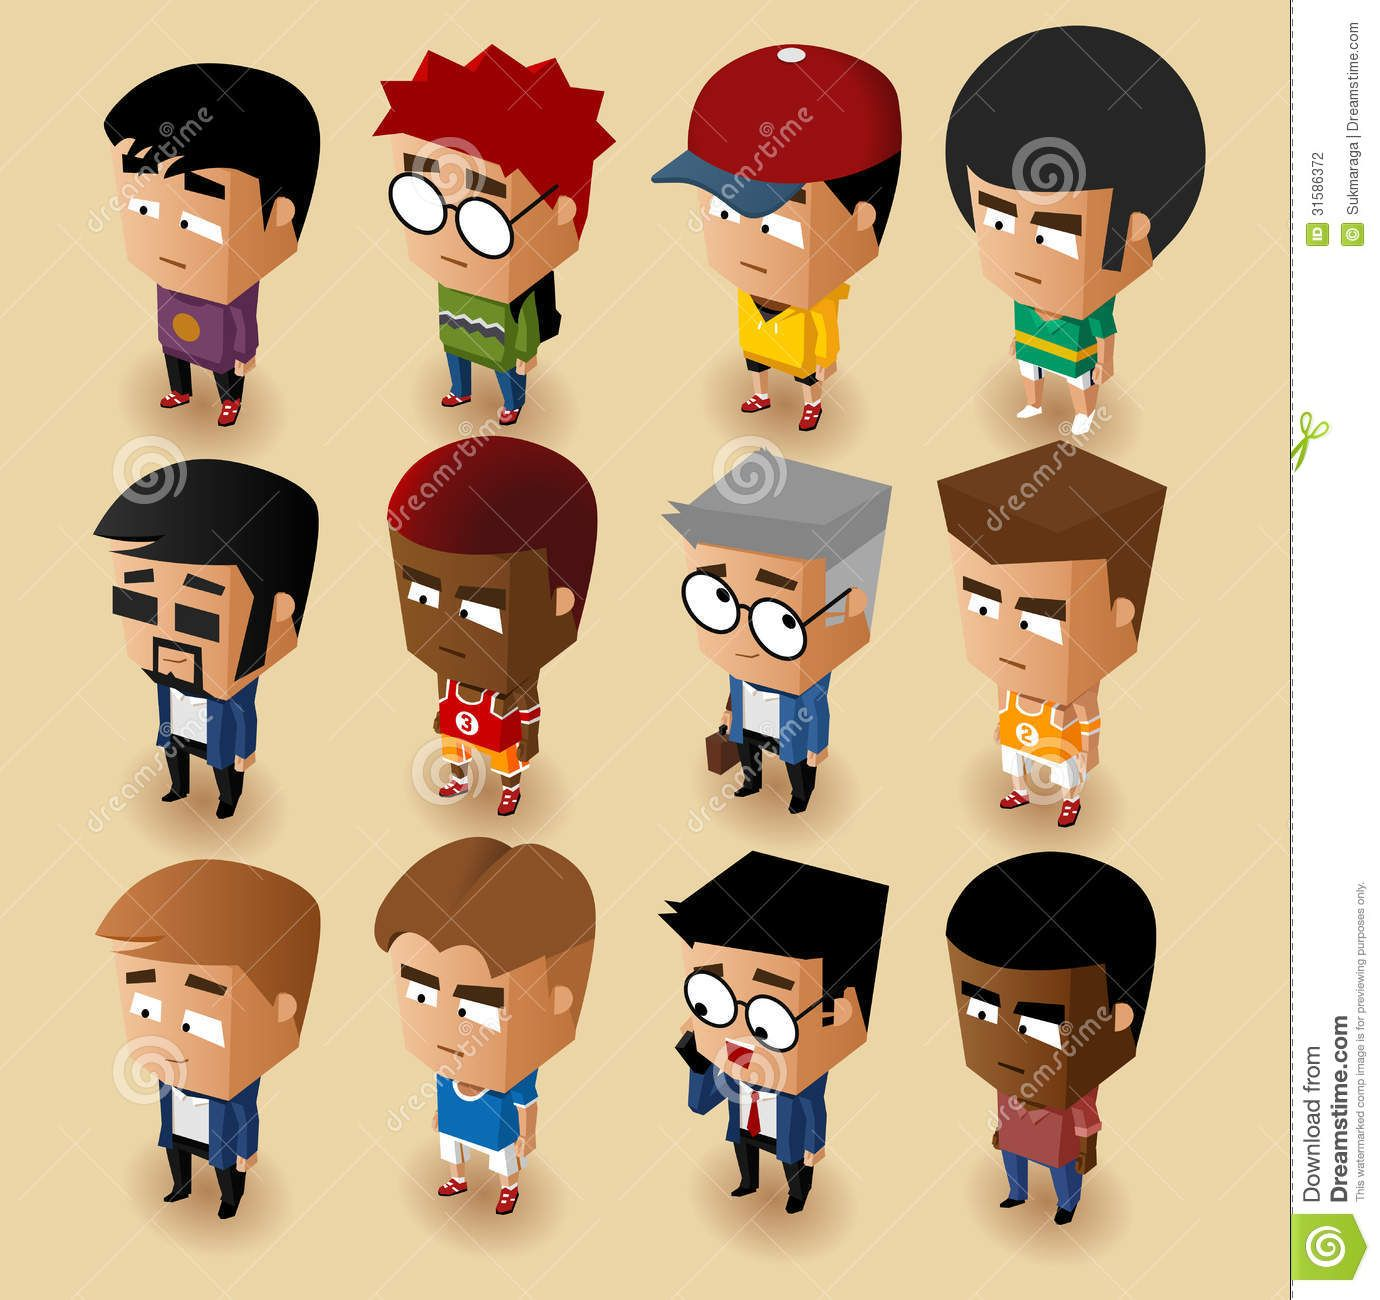 2d Character Design In Illustrator : D character illustrator google search